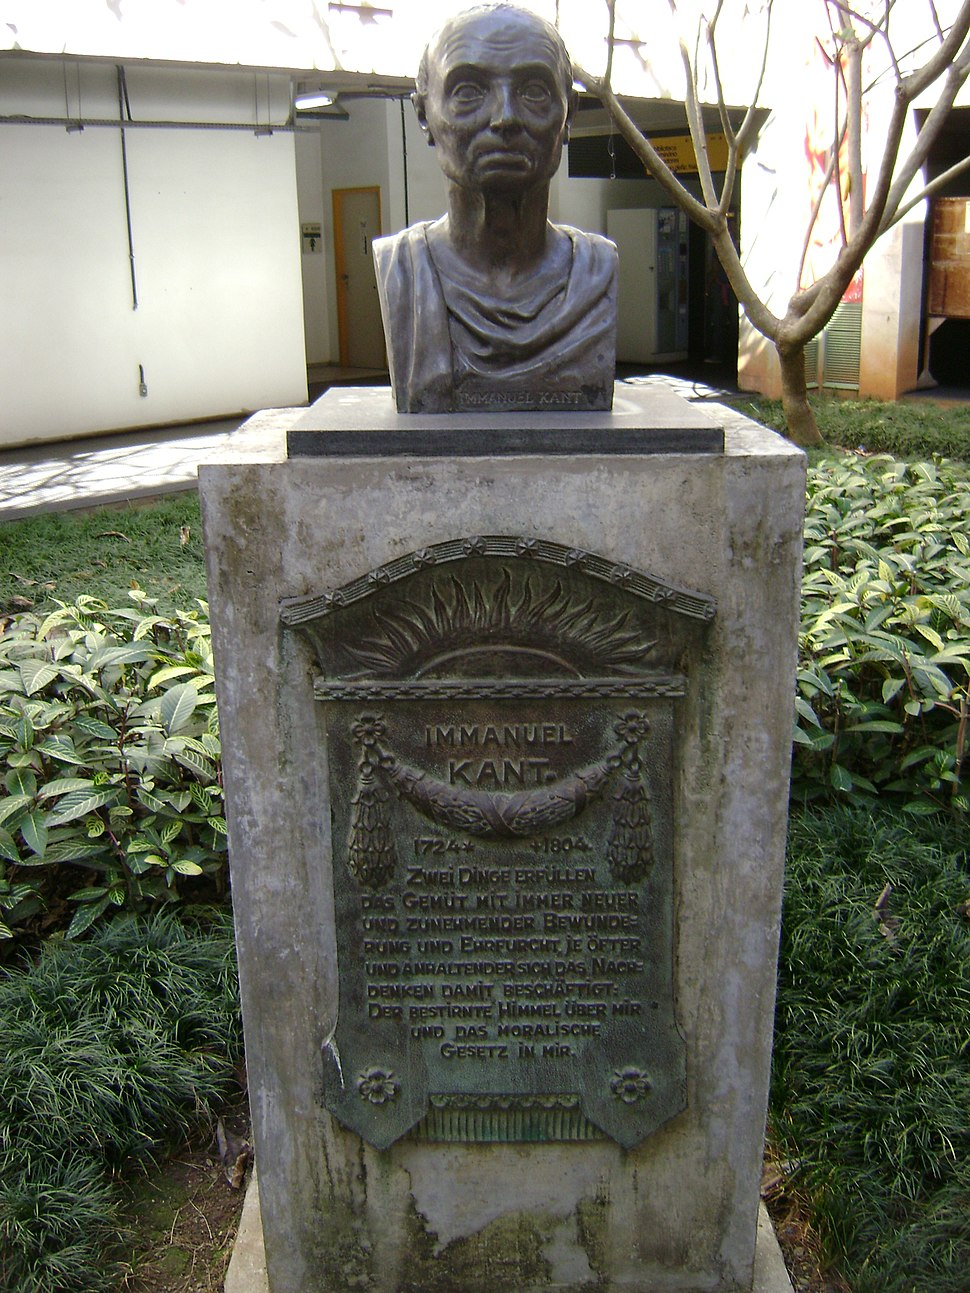 Immanuelkant